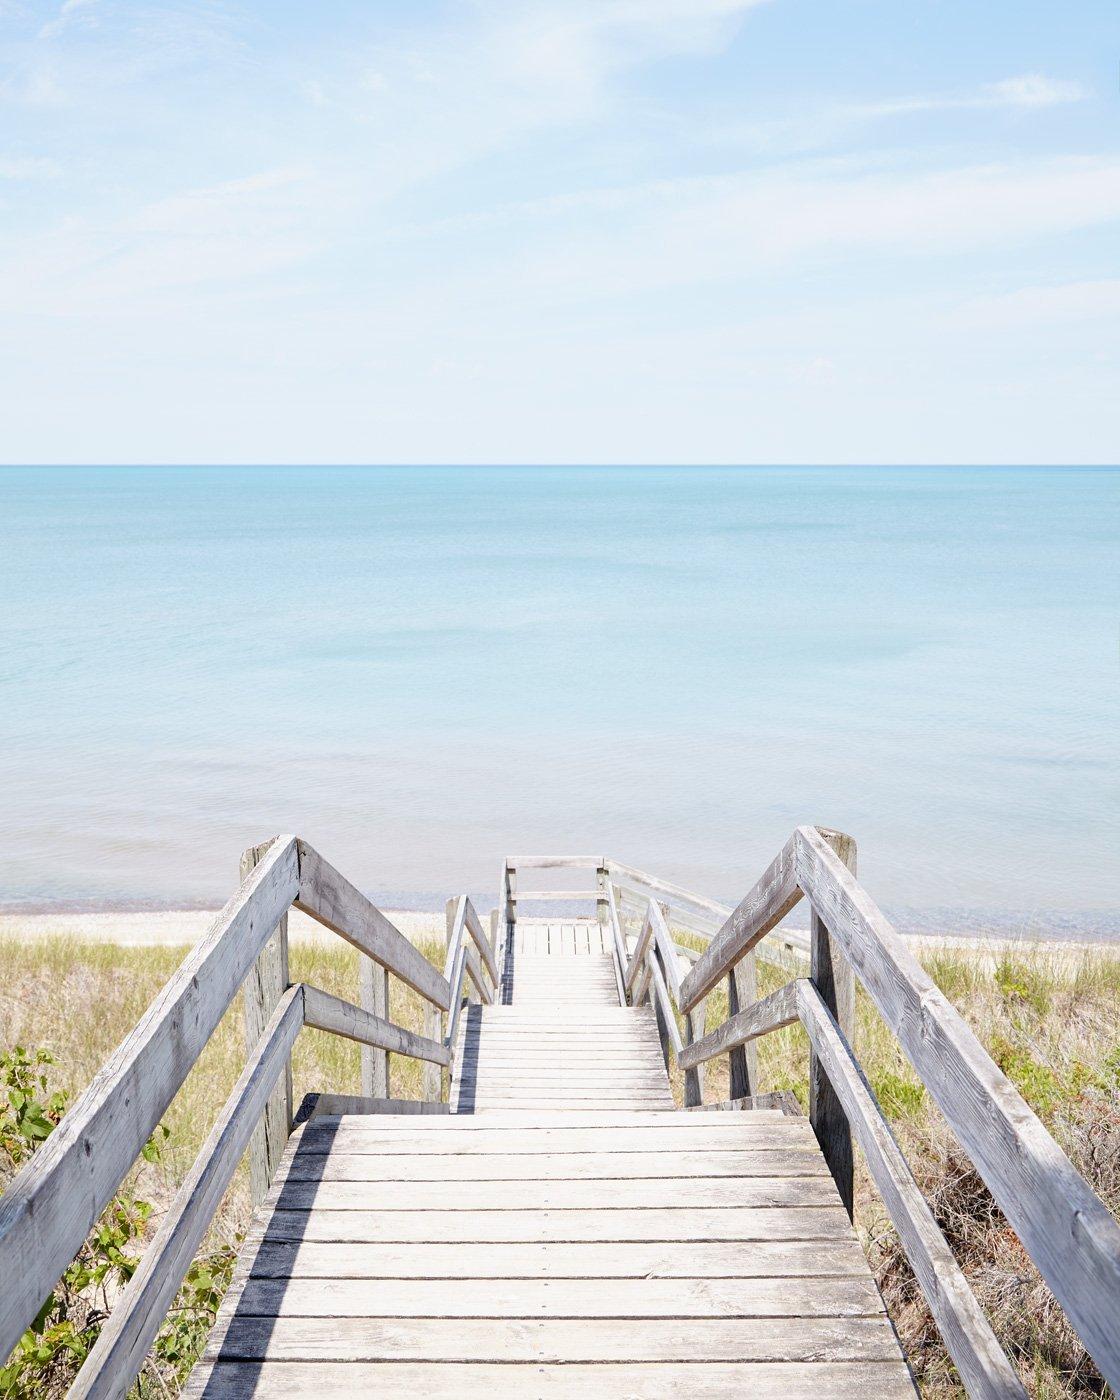 Pinery Steps Beach #1 Vertical - Canadian Art Print